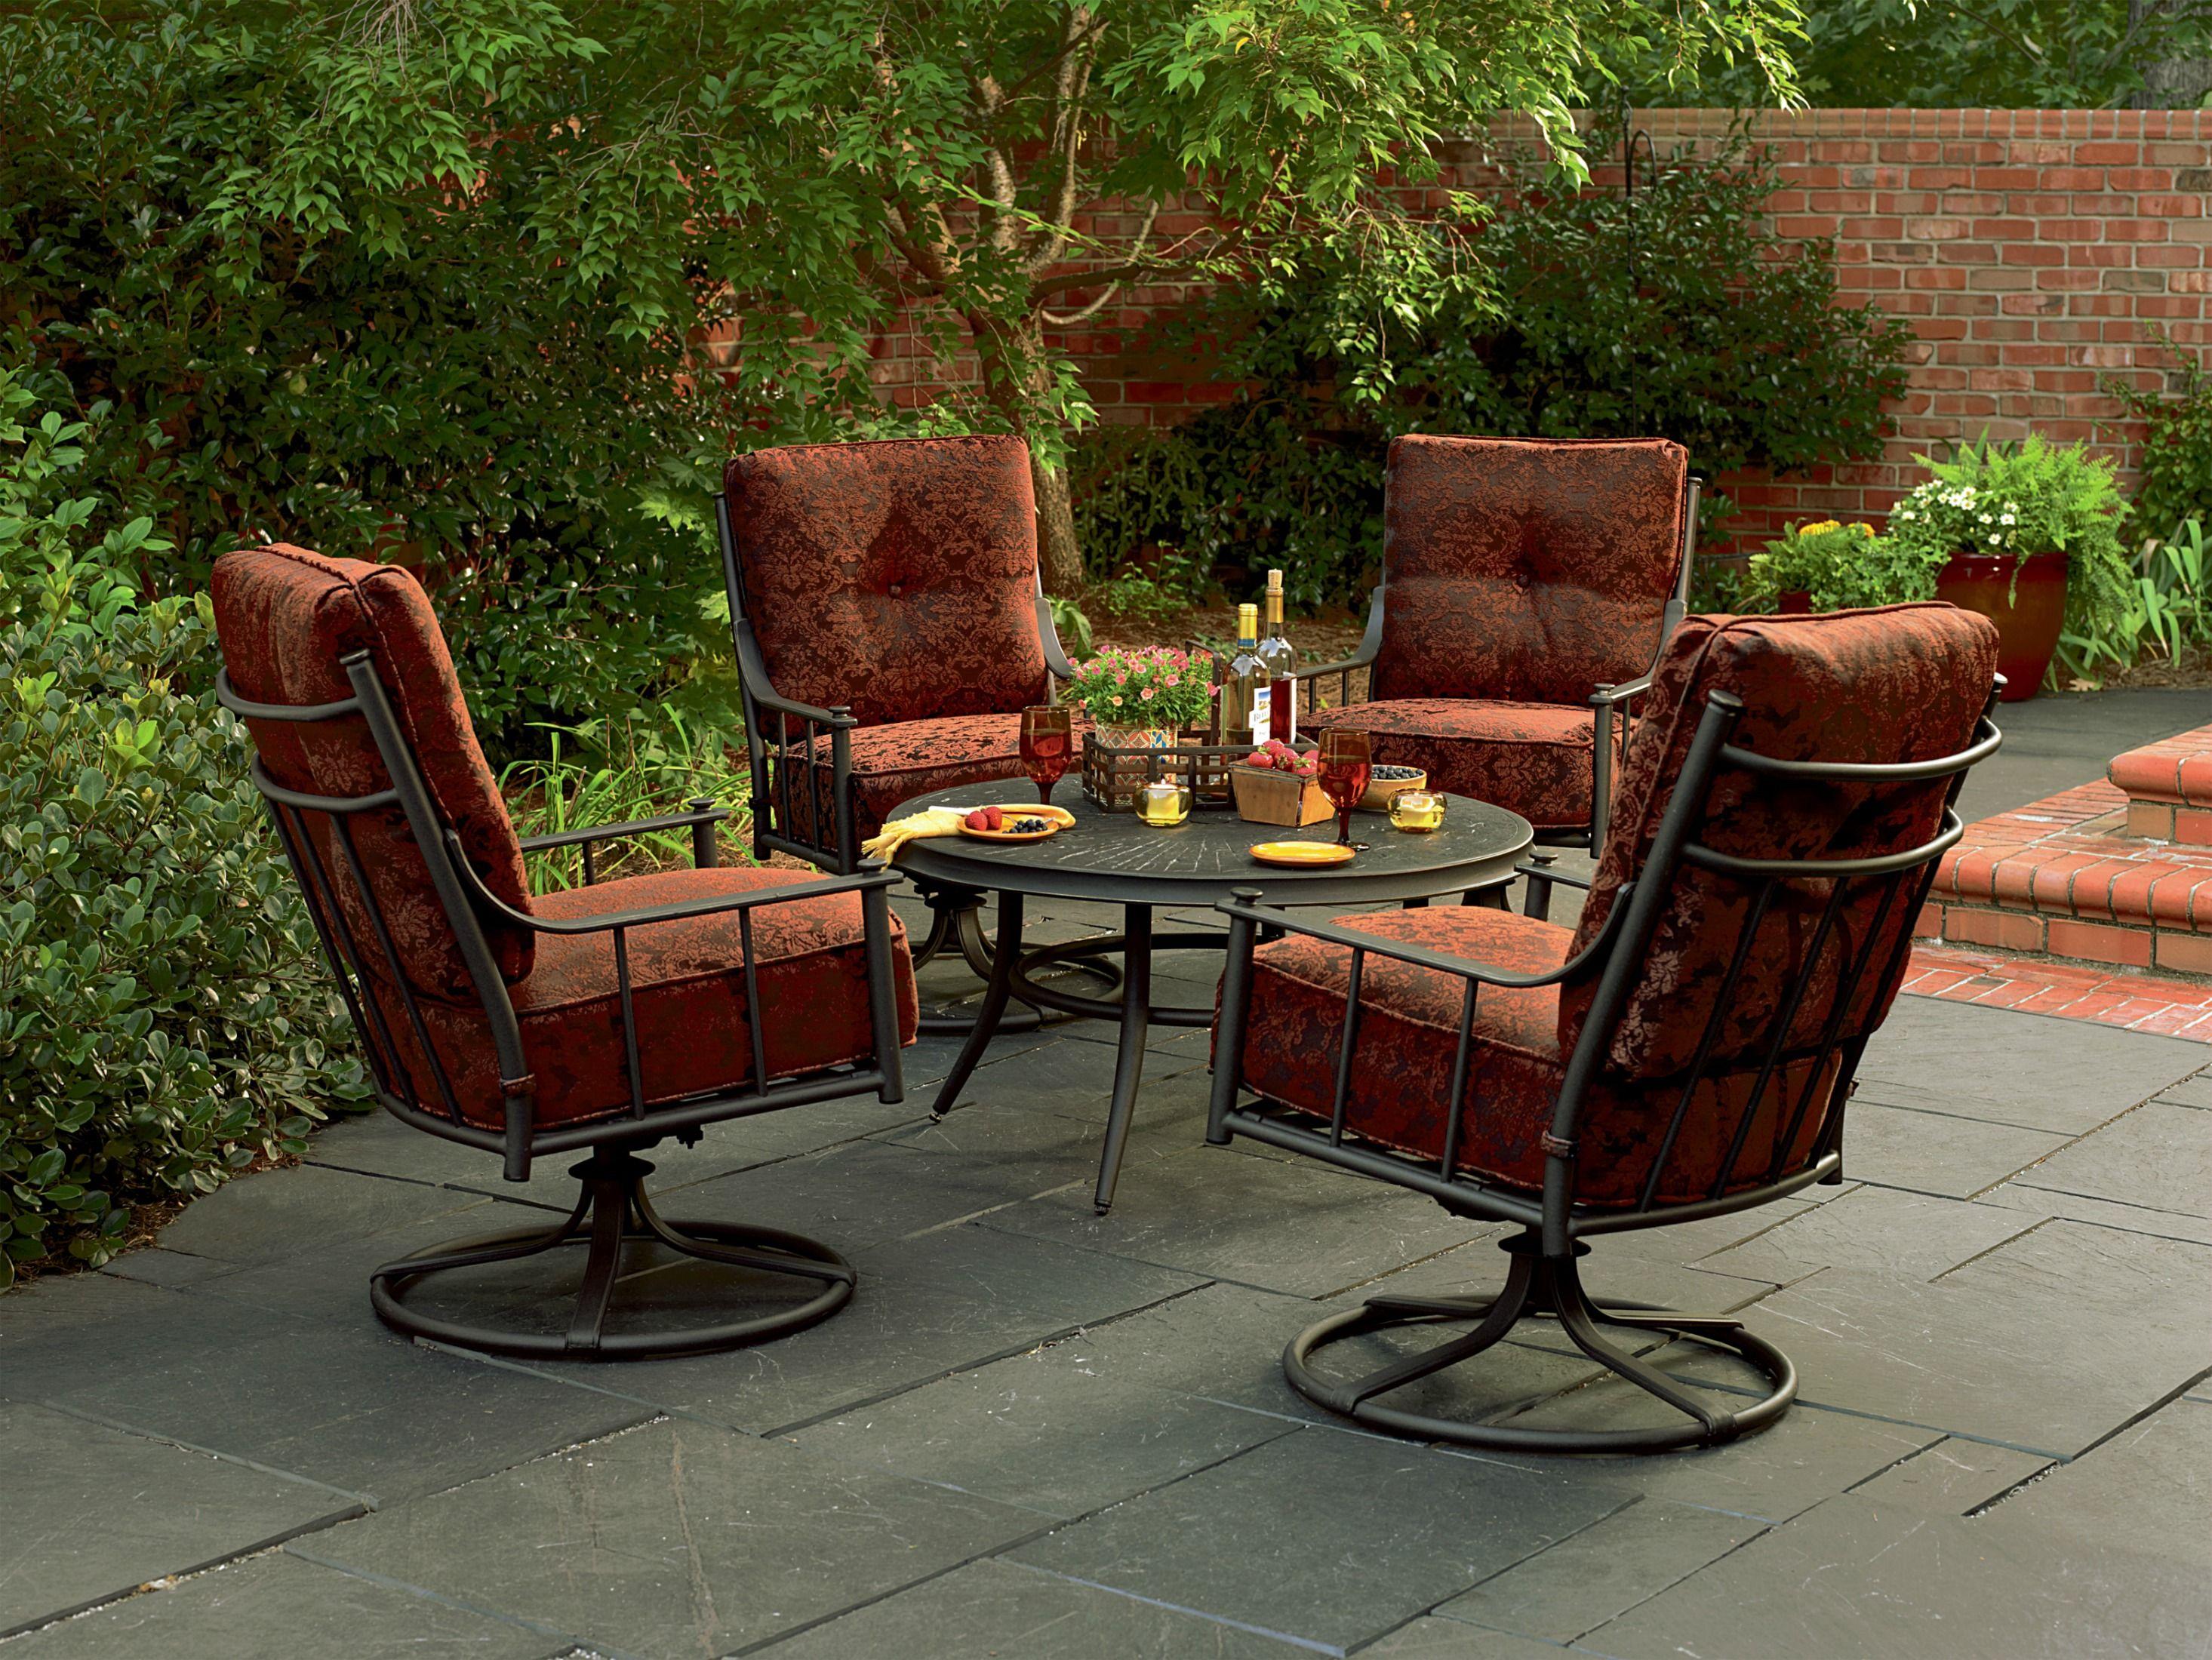 Garden Furniture Offers aluminum seating tropicraft patio furniture. 124 best patio